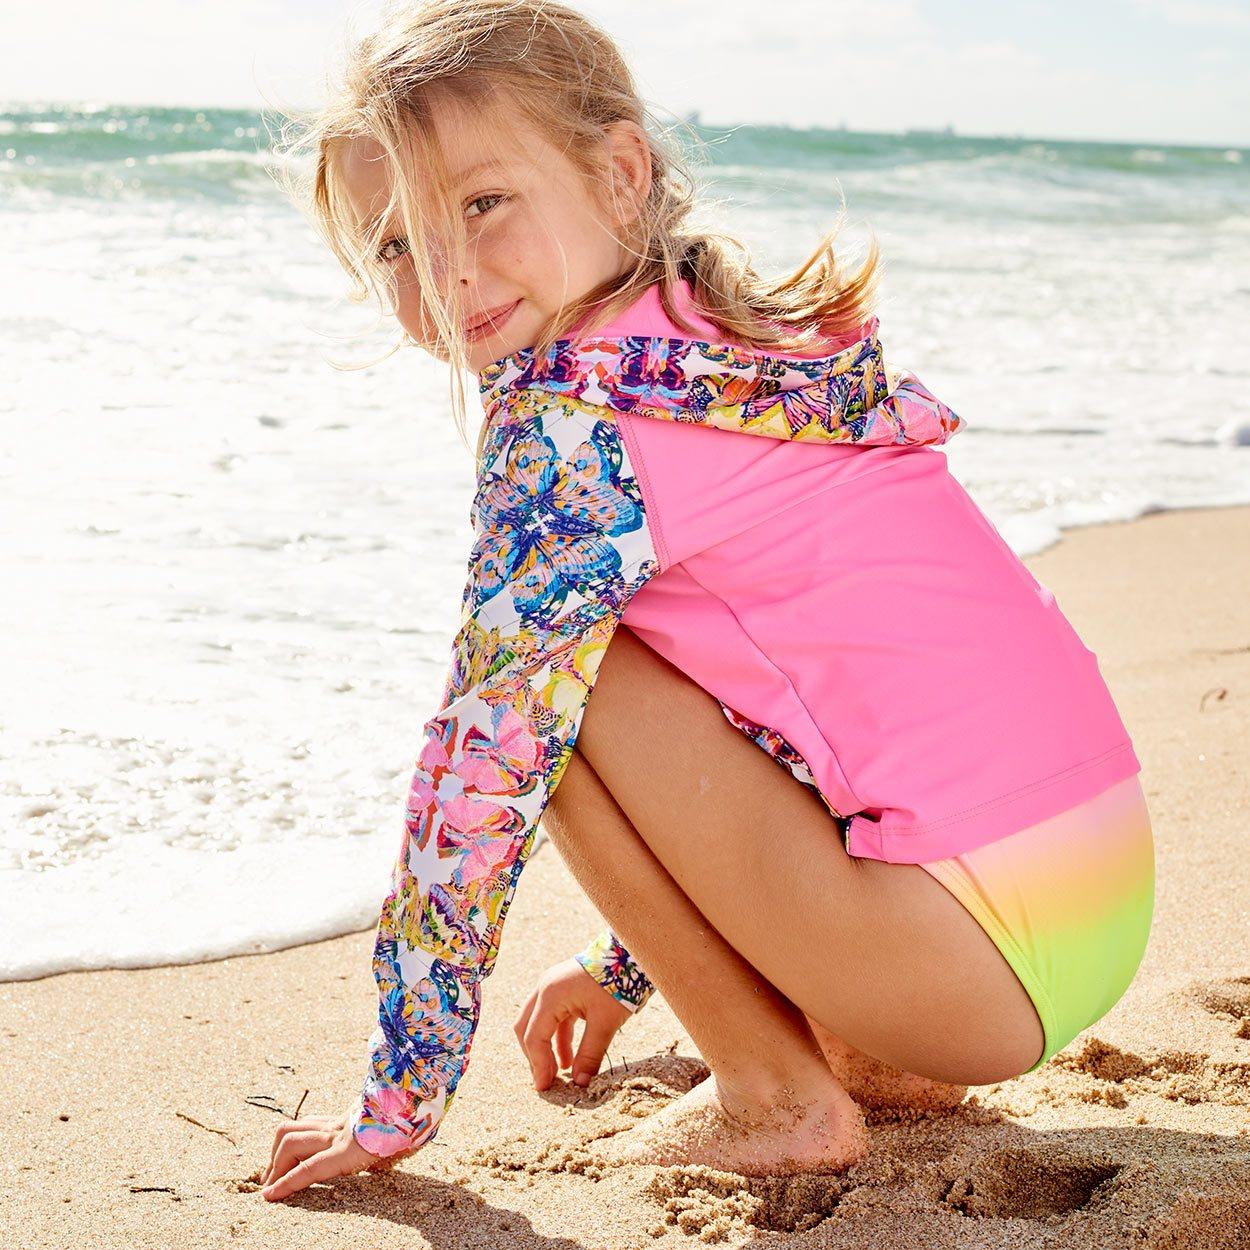 Opaline World Hybrid Zip Up Hoodie Upf50 Kids Girls Size 2 12 Butterflies Pink Multicolor Beach Girl Kneeling On The Sand Sunpoplife